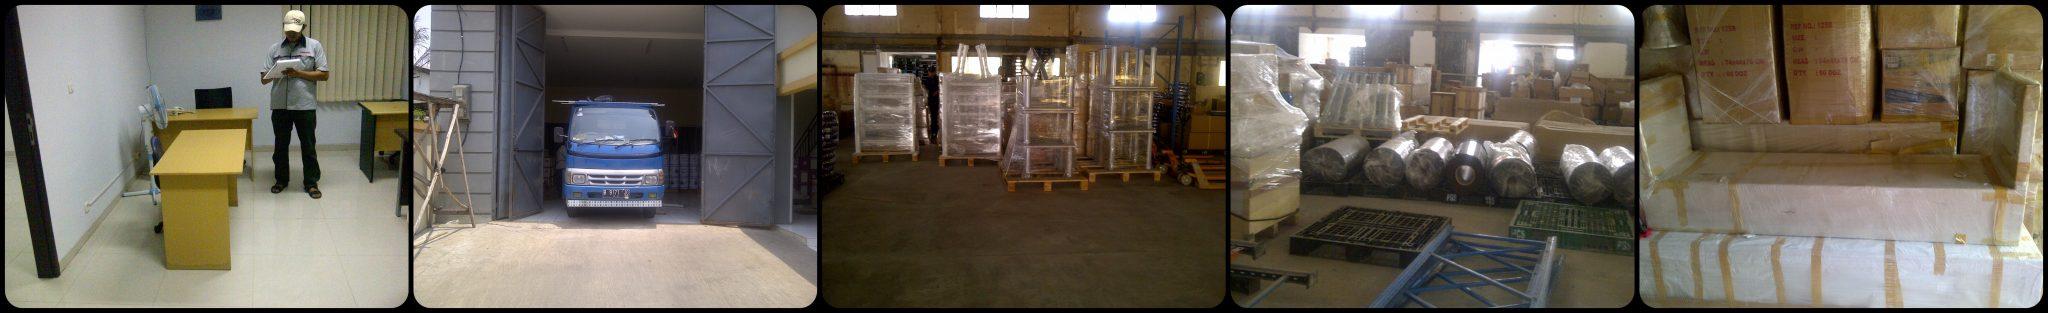 Jasa Penyimpanan Storage Askmover Indonesia 081294464406